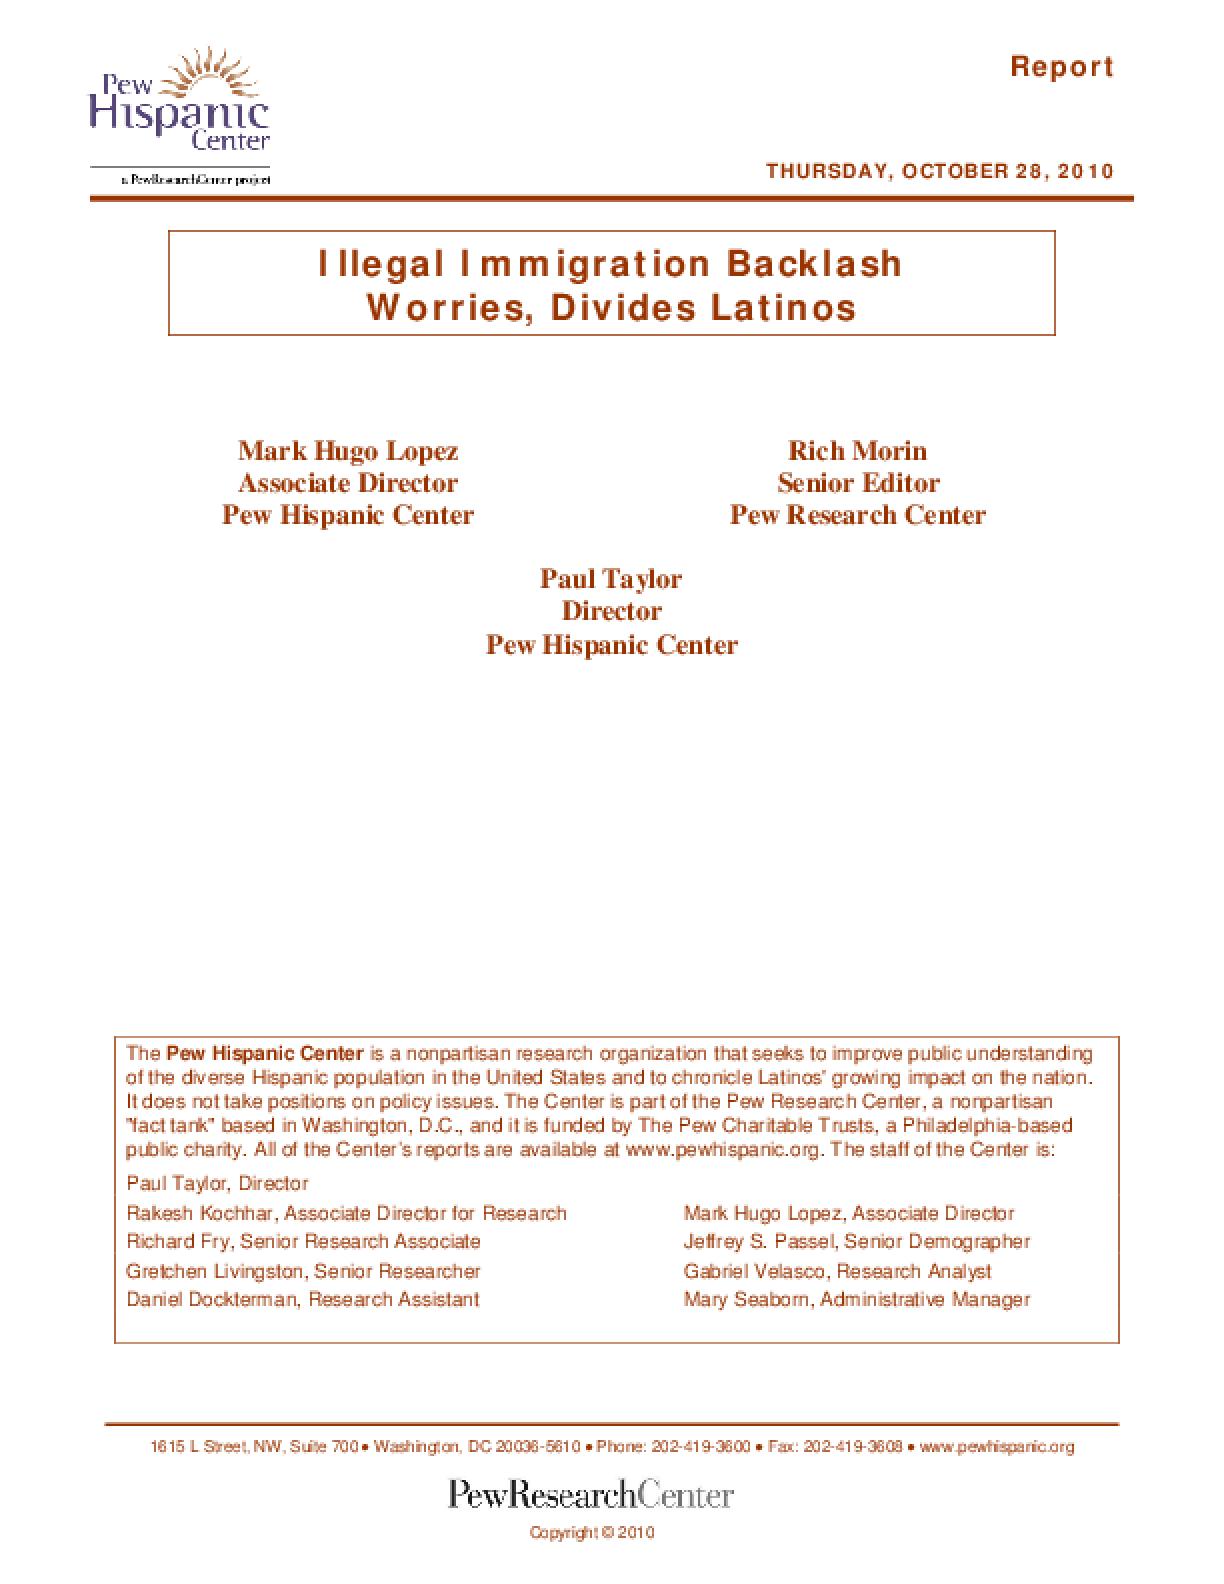 Illegal Immigration Backlash Worries, Divides Latinos